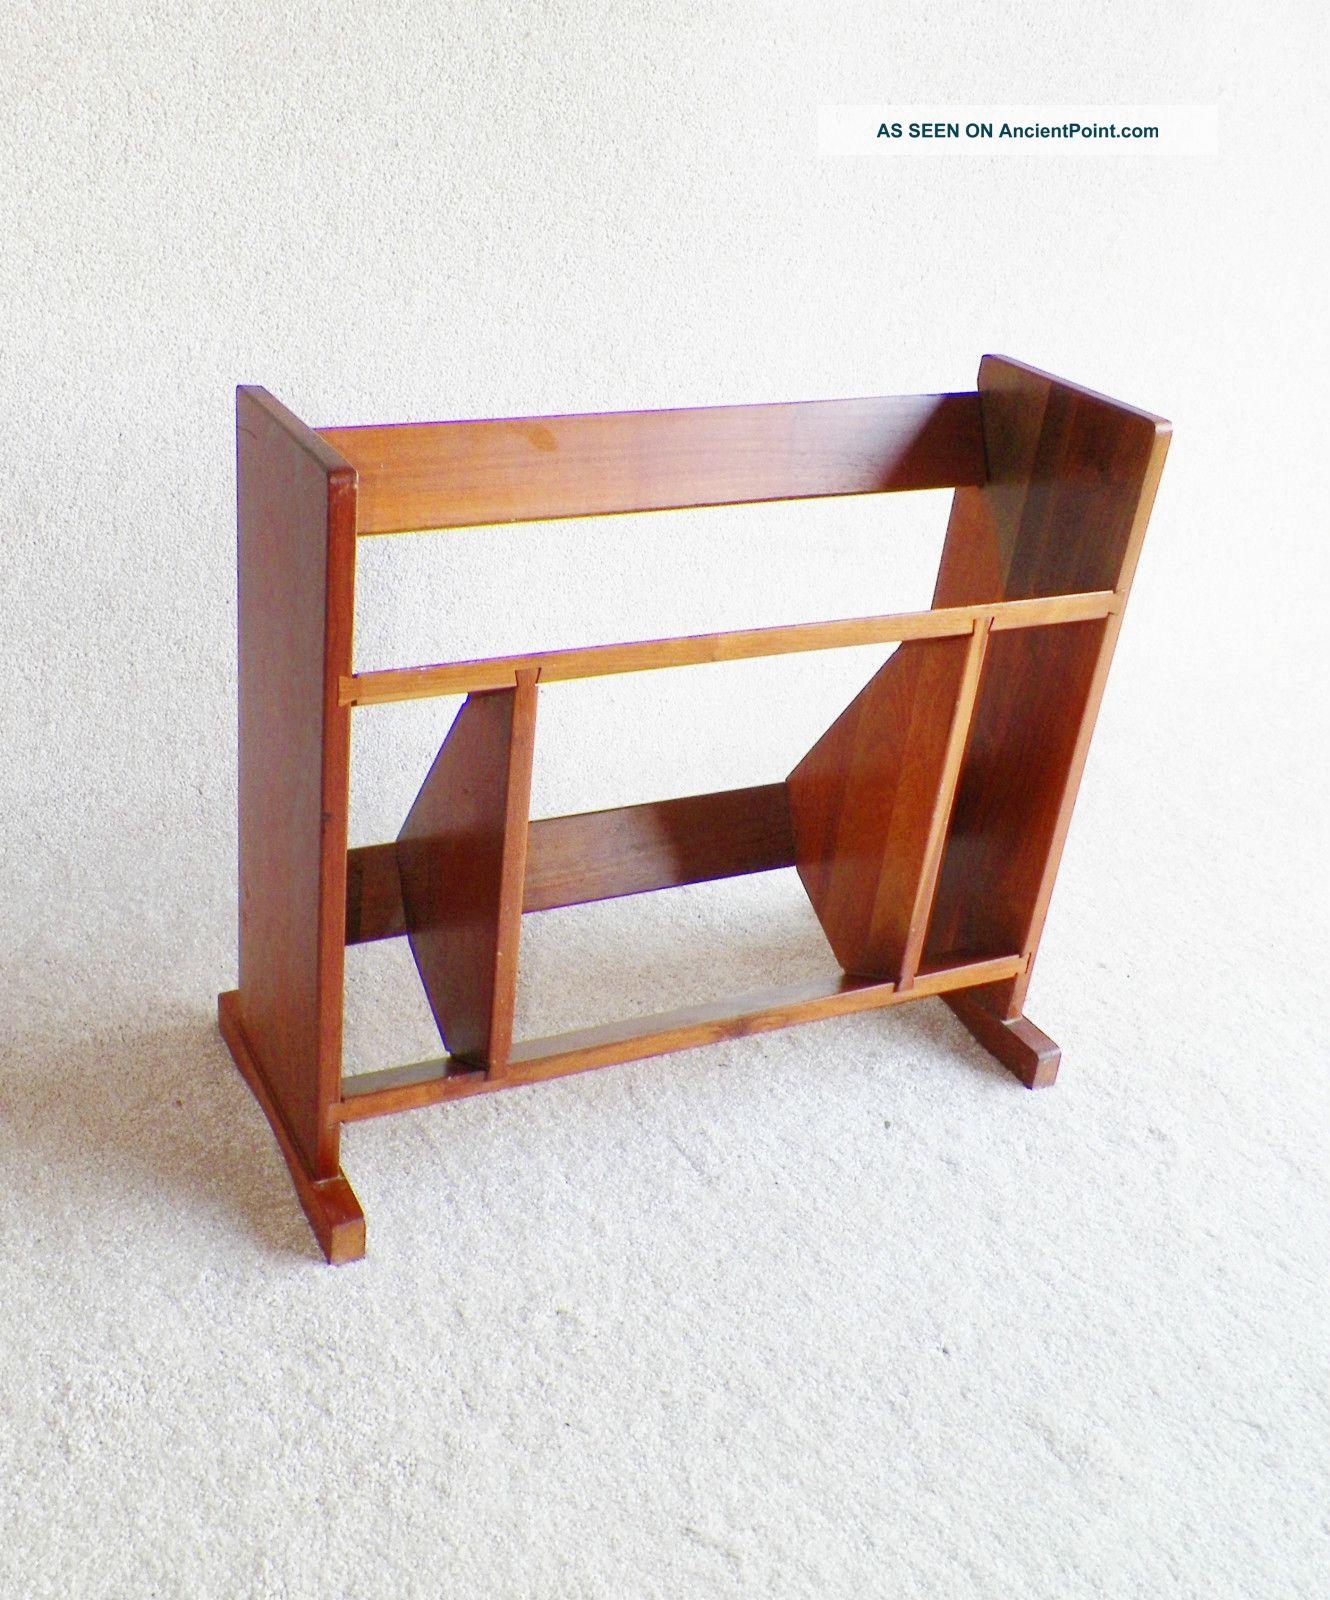 Image of: Danish Modern Mid Century Modern Walnut Bookcase Eames Mccobb Era